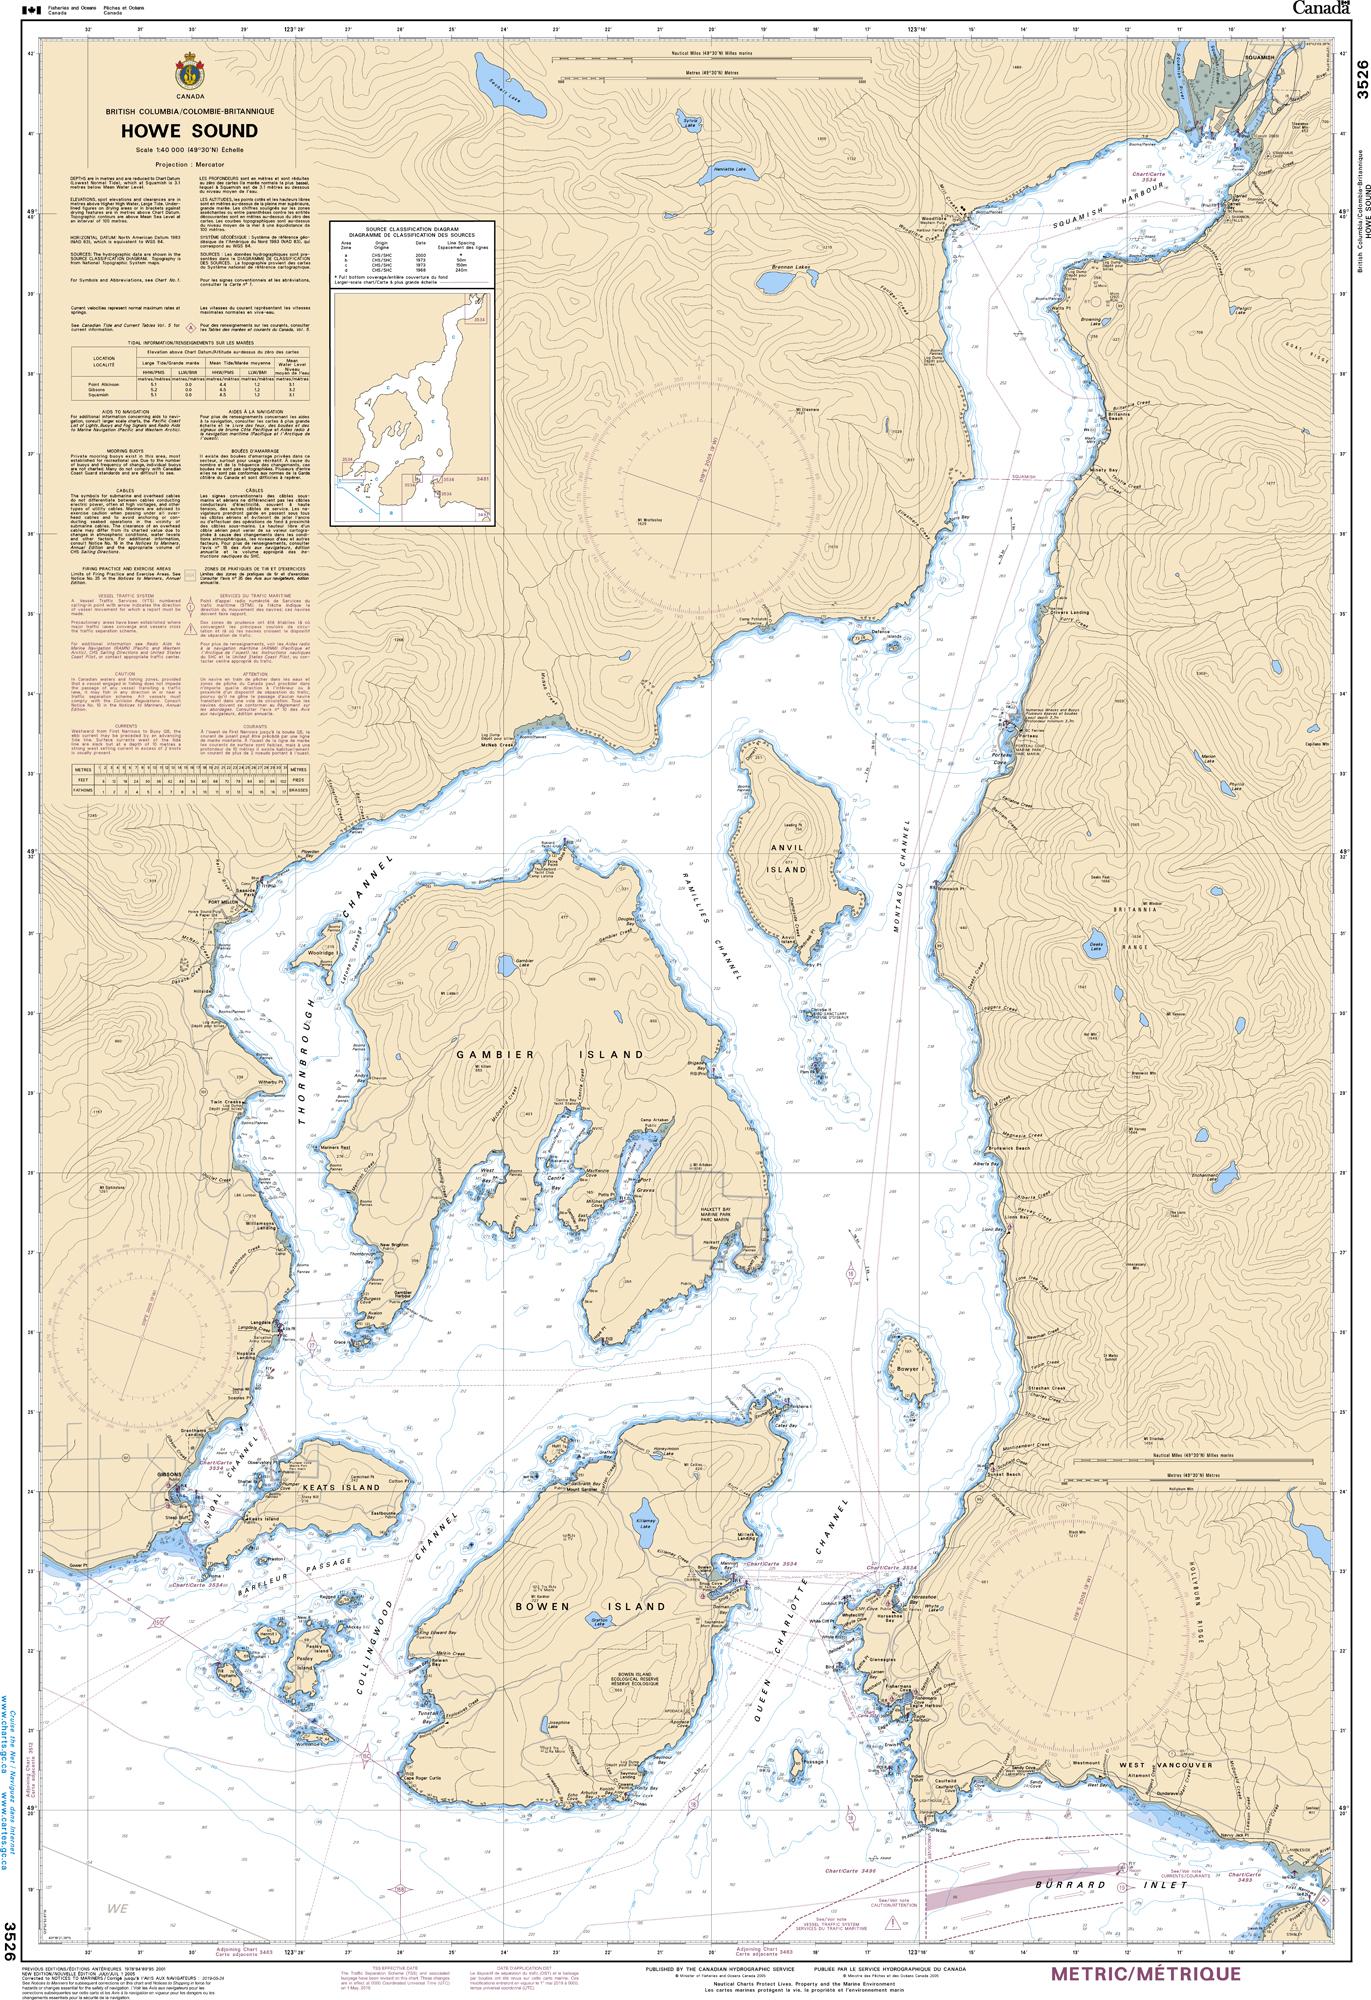 Pacific Region, CHS Chart 3526: Howe Sound